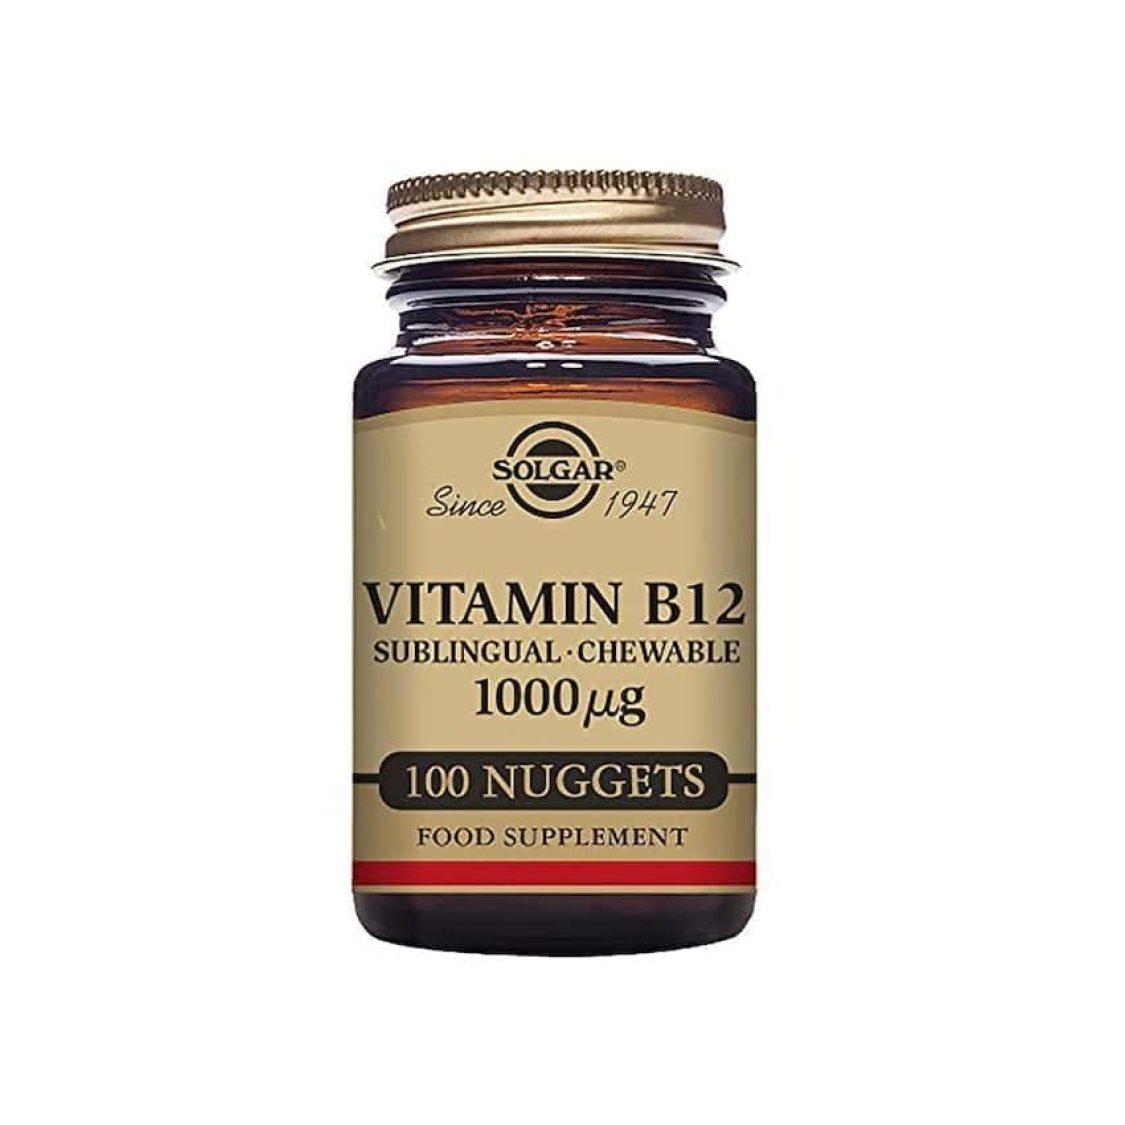 Solgar - Vitamin B - Vitamin B12 Nuggets 1000ug - Size: 100